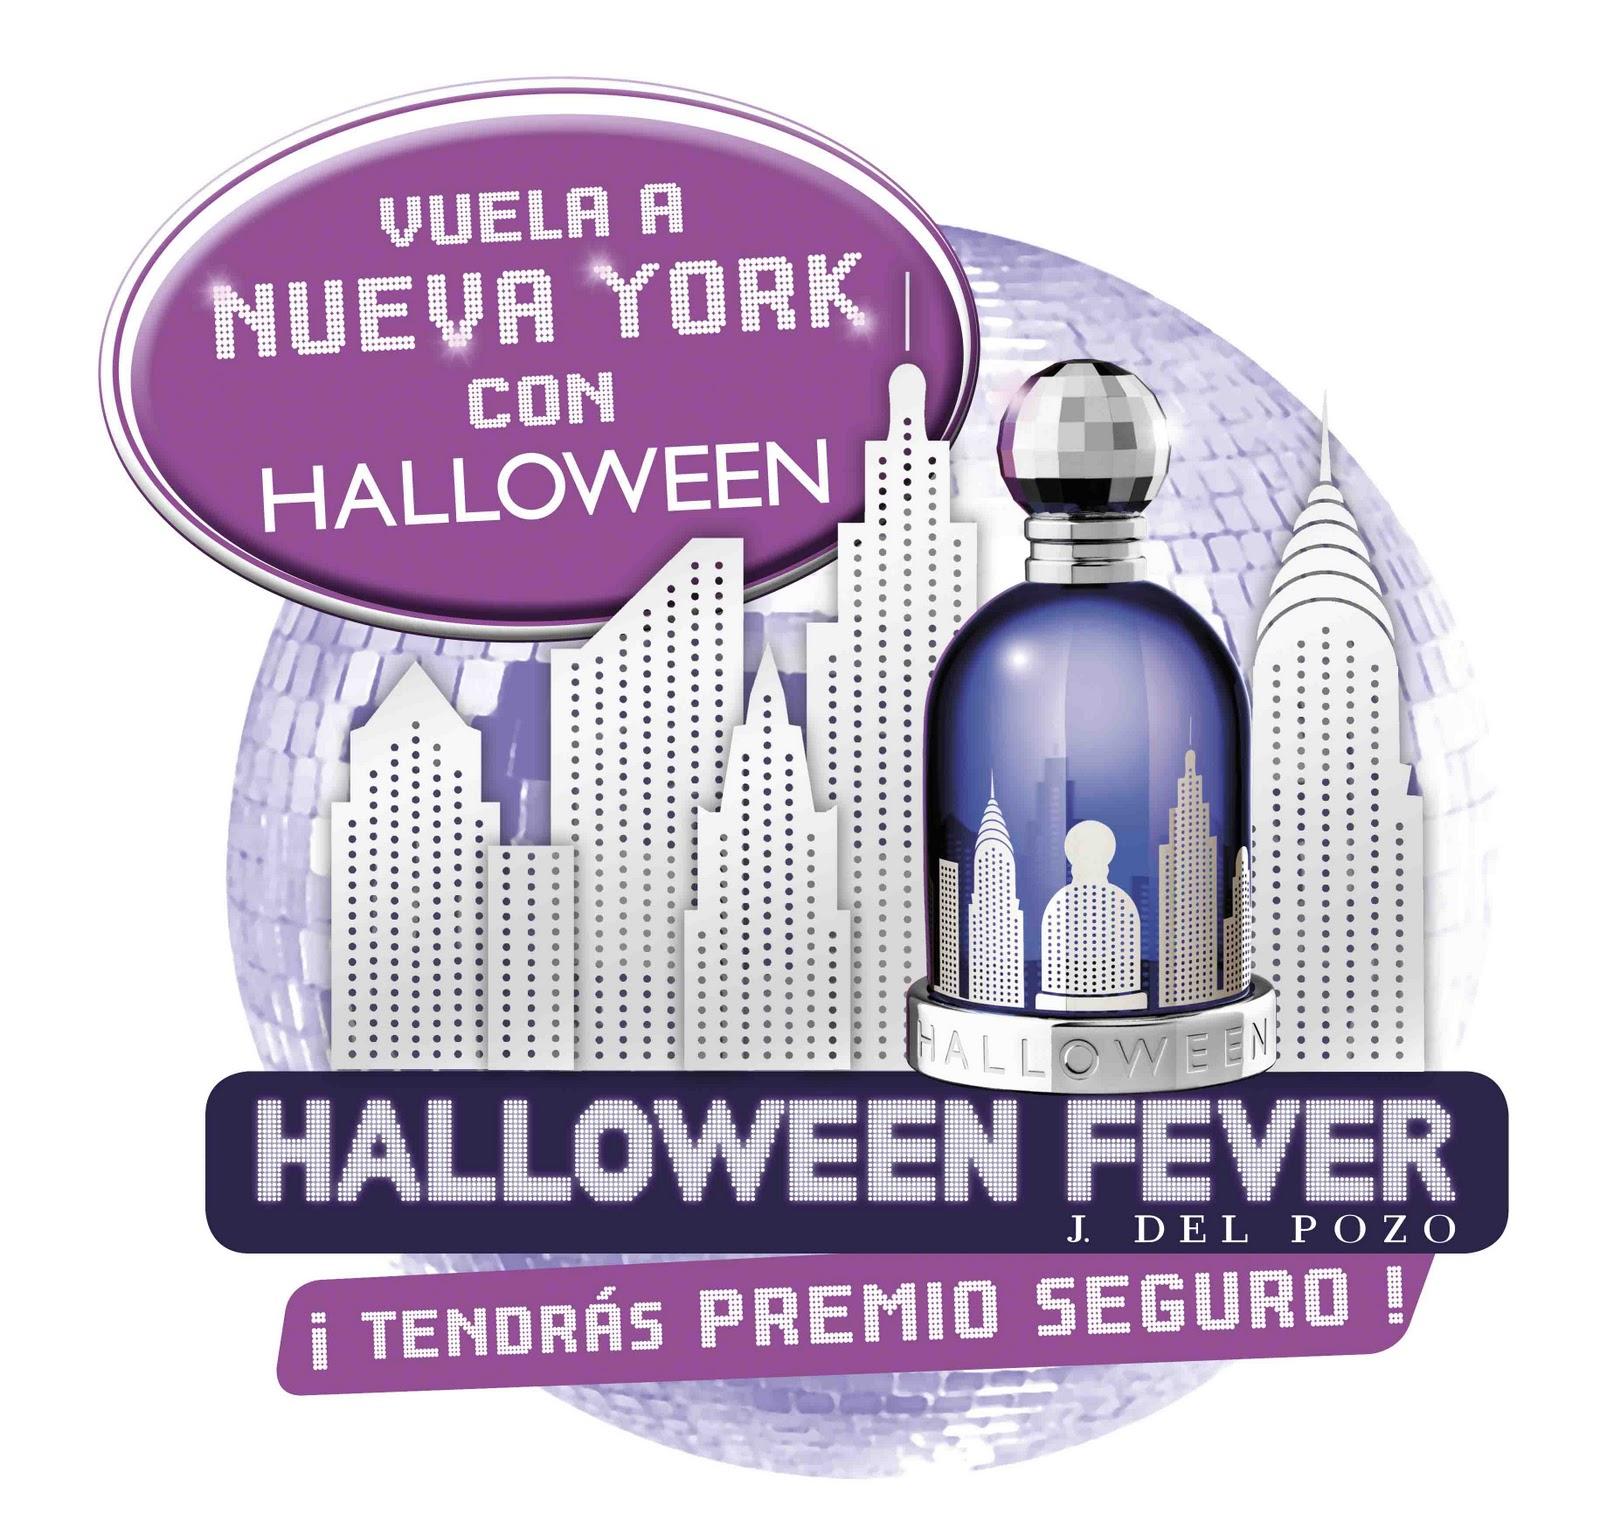 Halloween Fever jesus del pozo